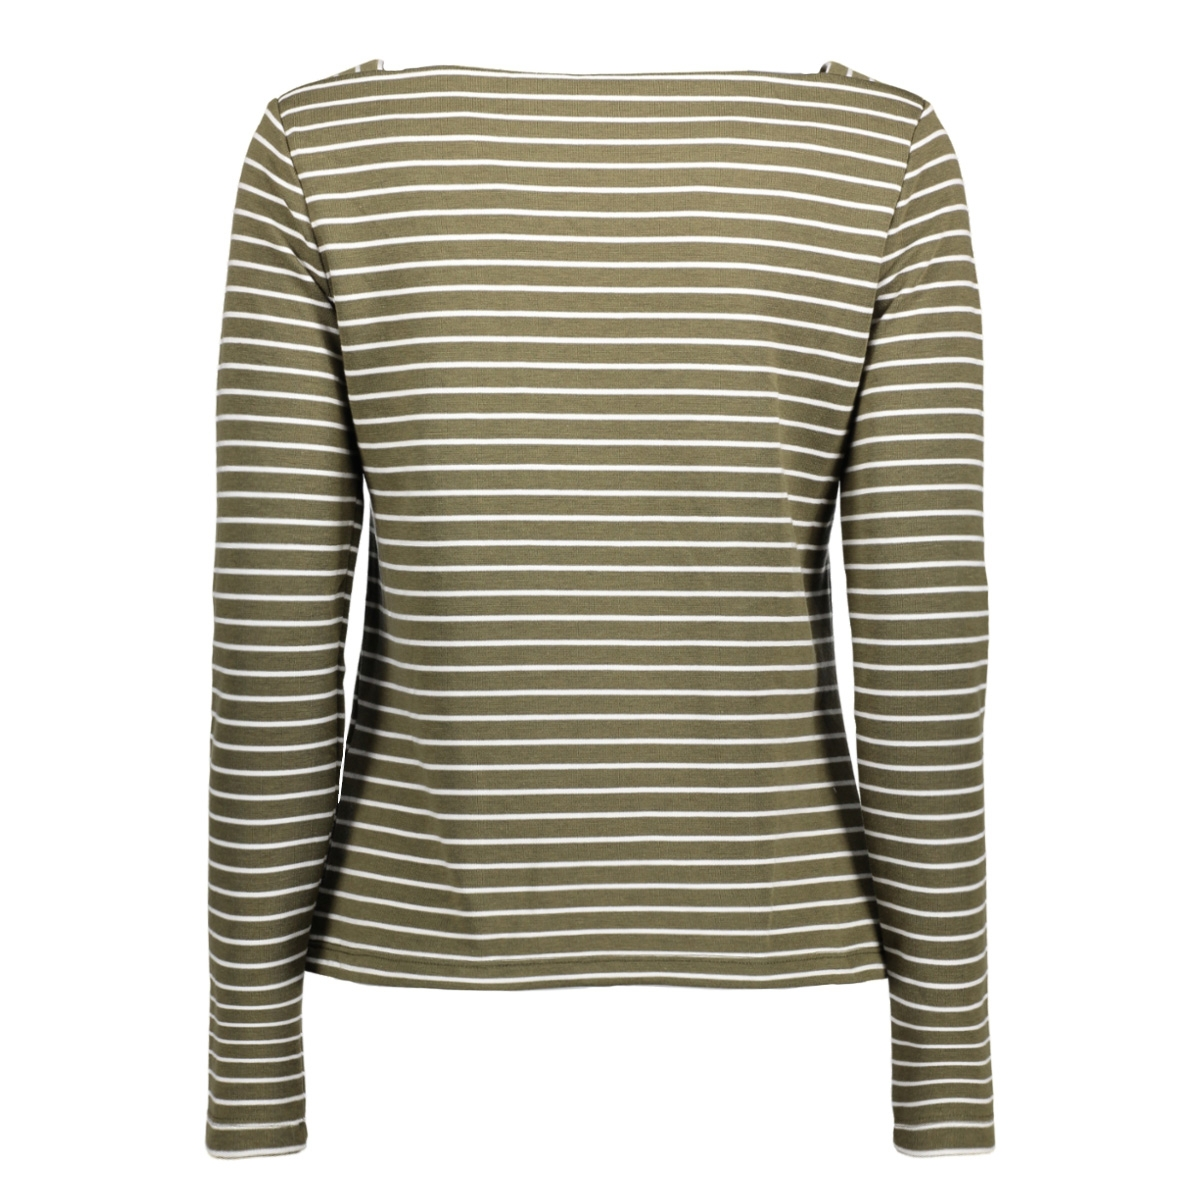 visonja l/s t-shirt/pb 14044392 vila t-shirt ivy green / cloud dancer